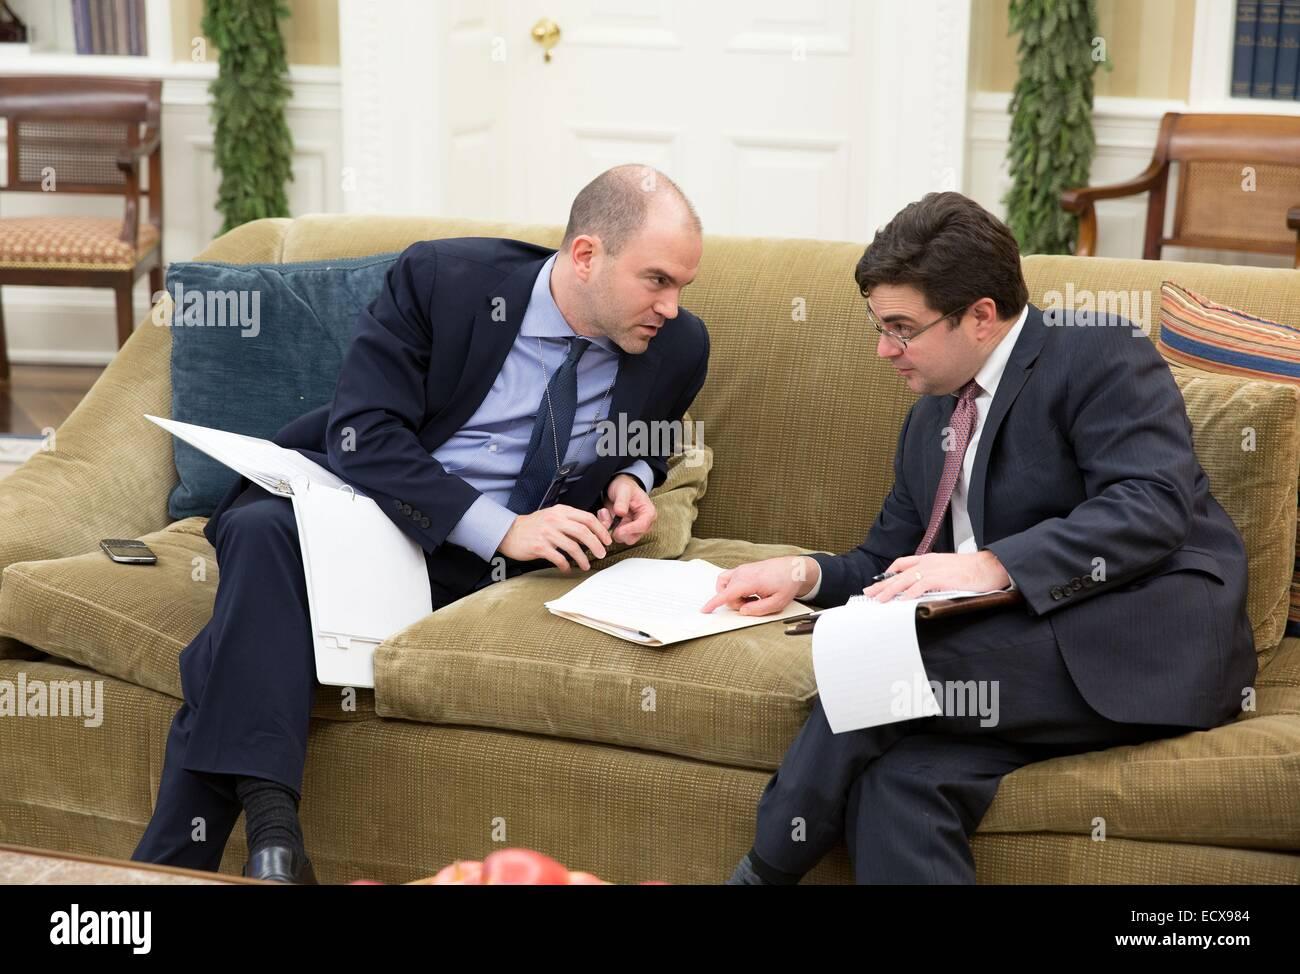 US Deputy National Security Advisor Ben Rhodes, left, confers with Ricardo Zuniga, National Security Council's - Stock Image